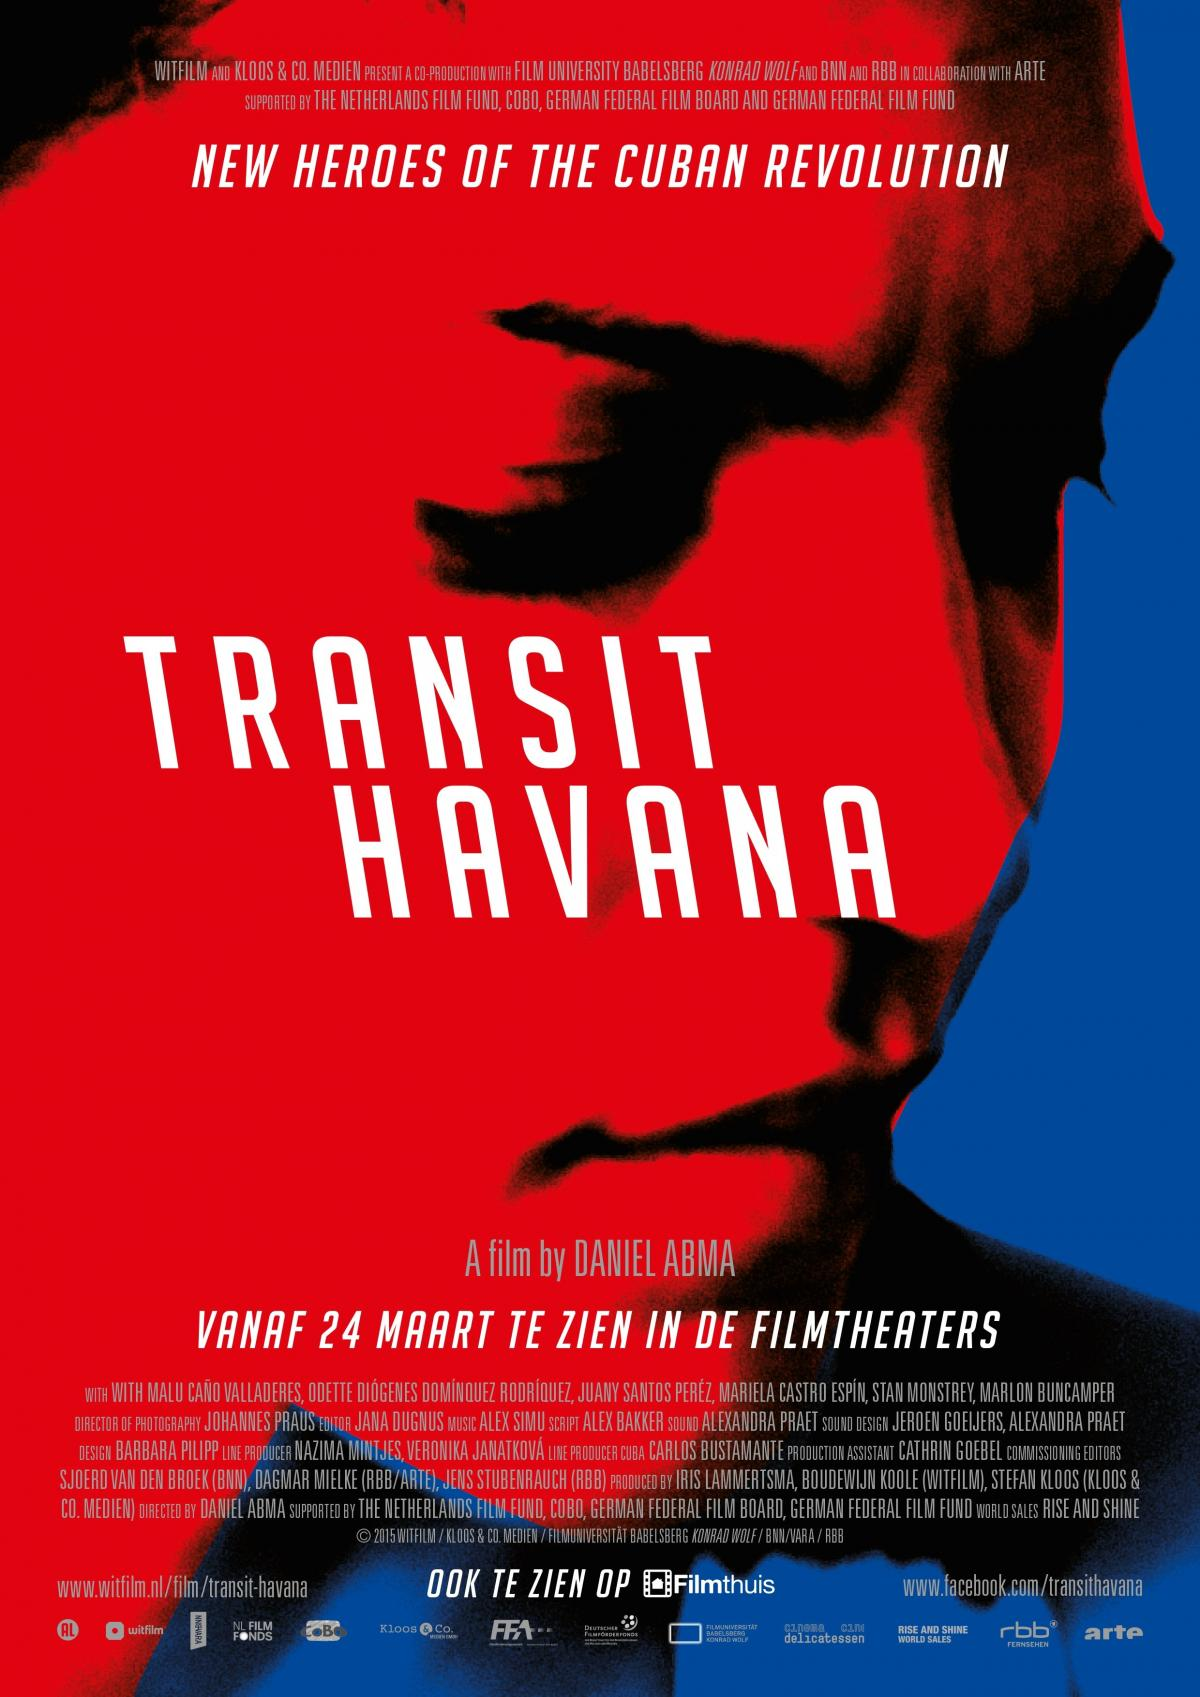 Havanna Film